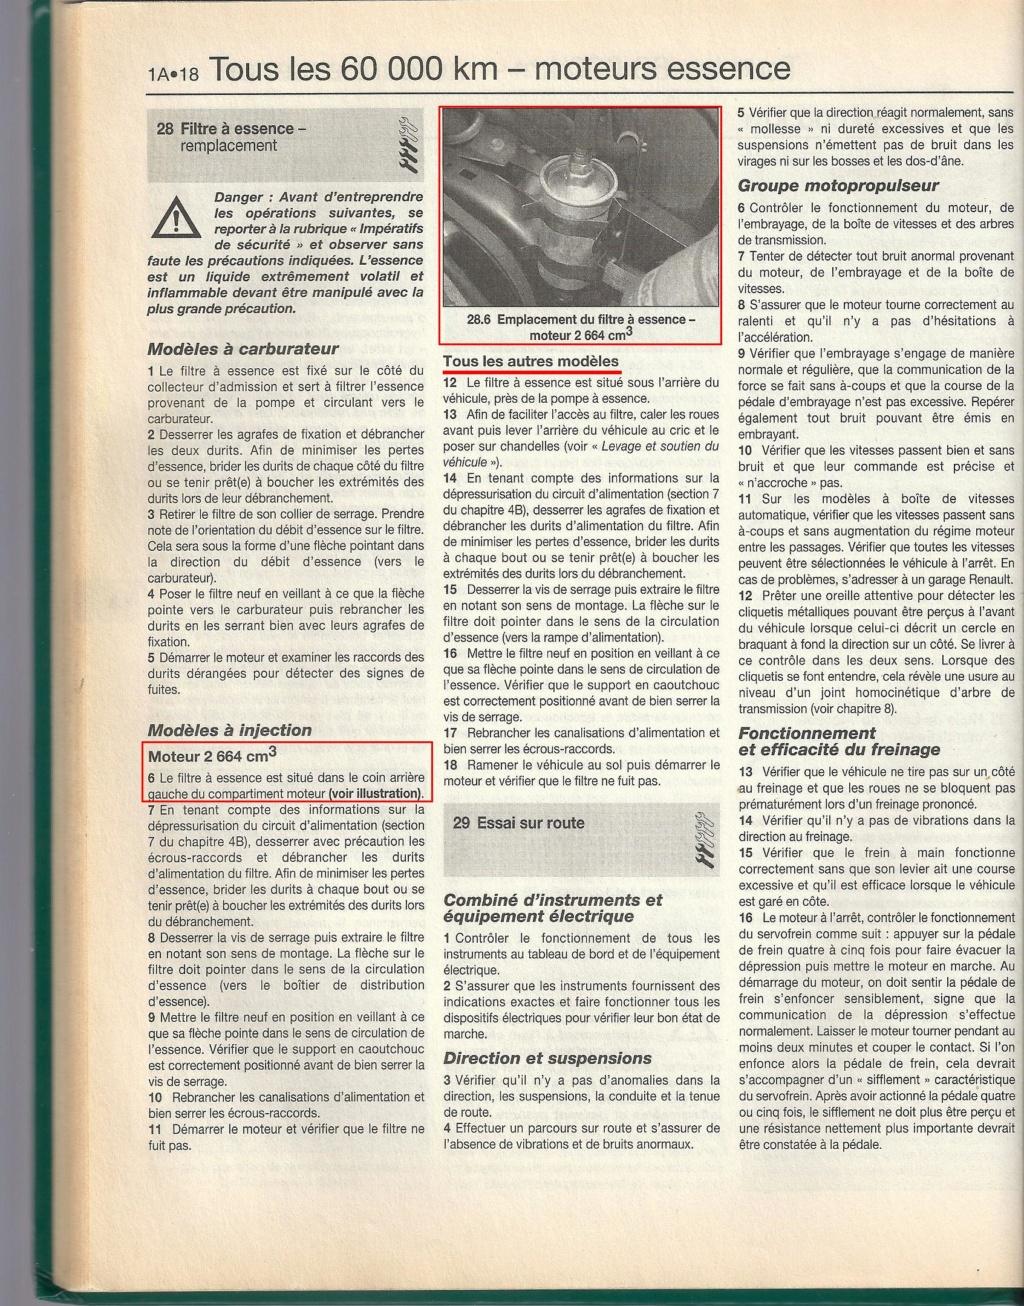 Renault 25 v6 turbo de 1987 Numzor15